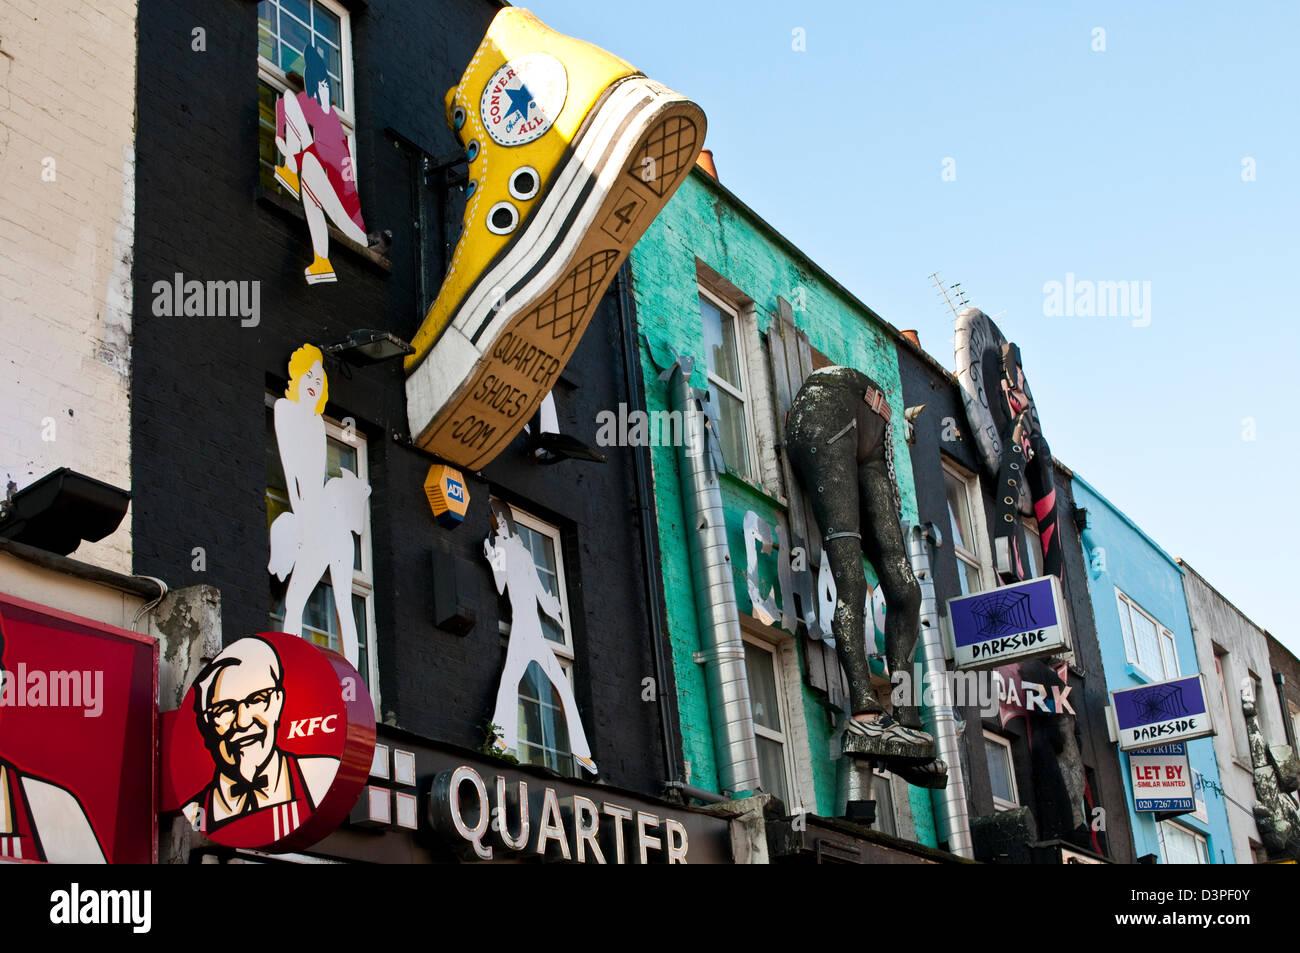 Converse trainer, Camden High Street, Camden Town, NW1, London, UK - Stock Image